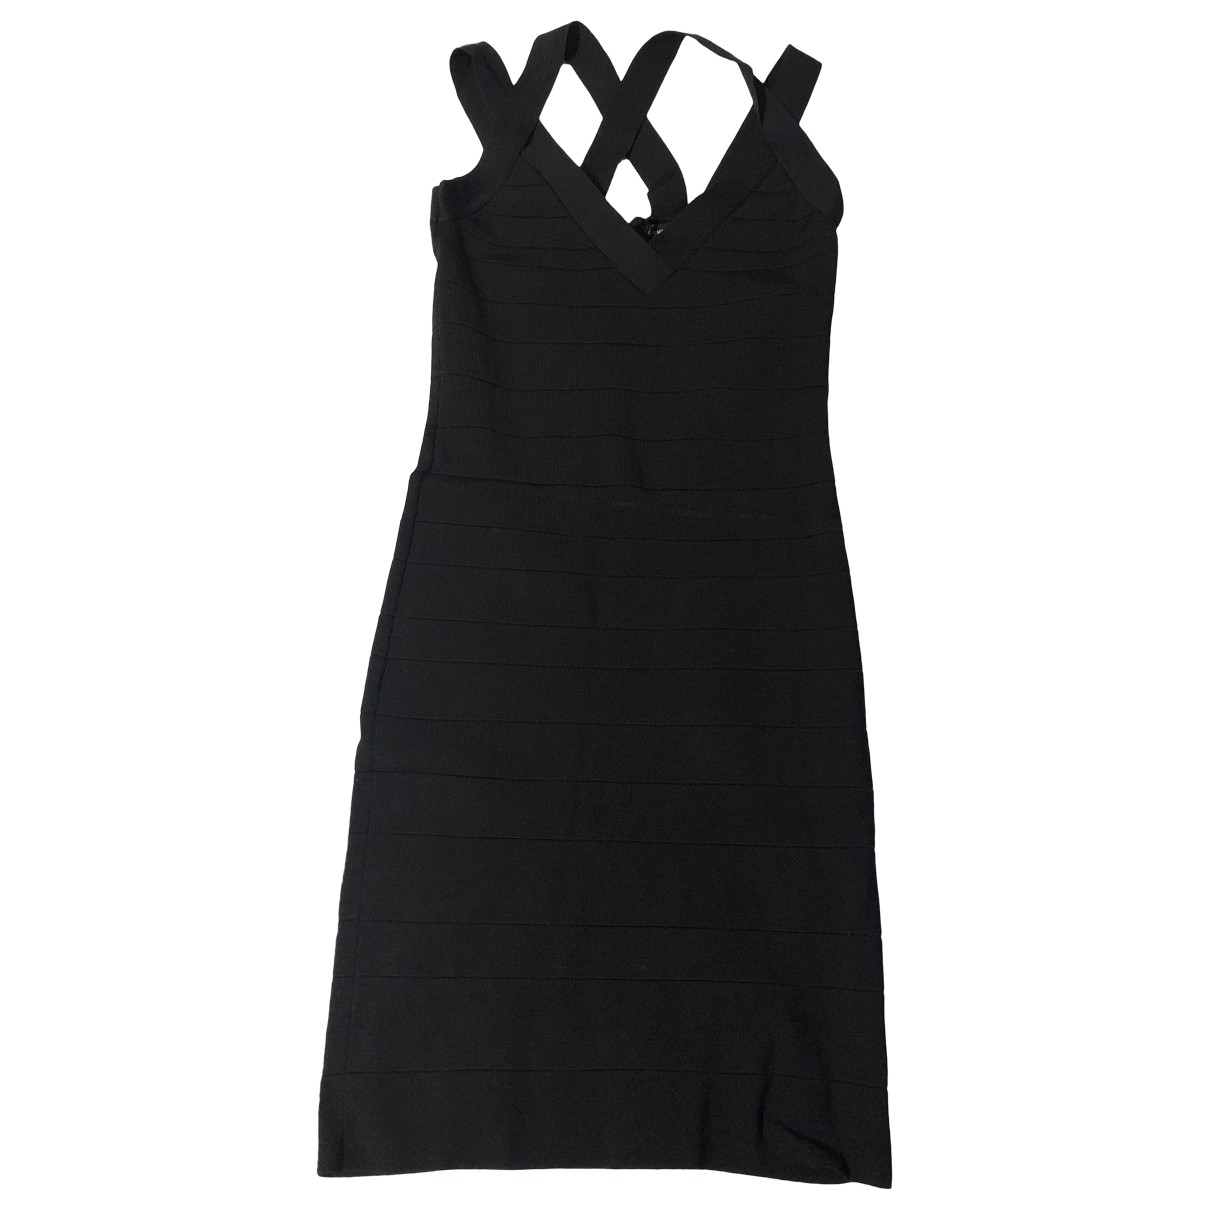 Karen Millen \N Black dress for Women S International